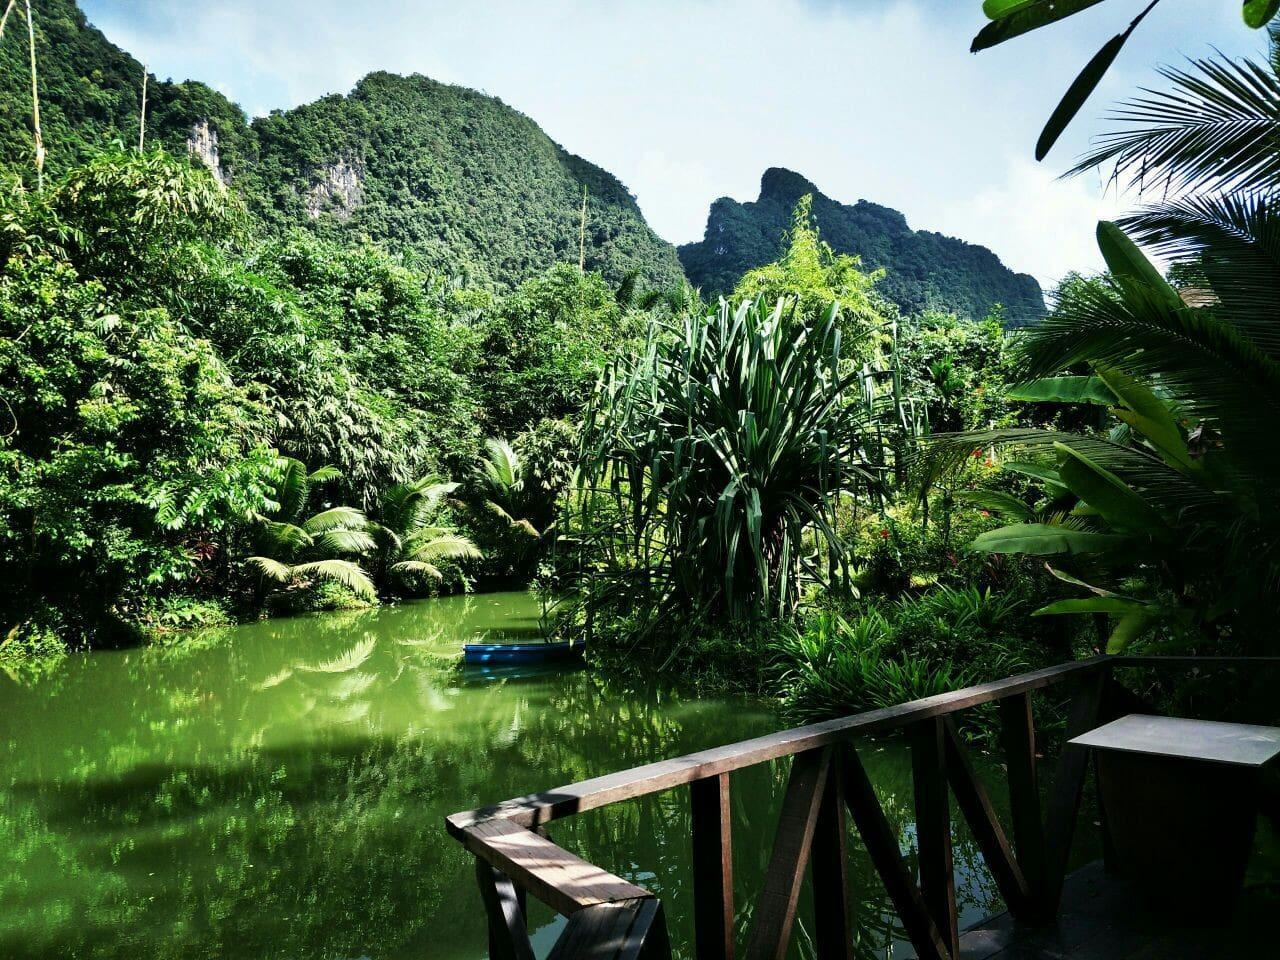 Bu Nga Sahree. On The Hill Facing A Peaceful Pond.